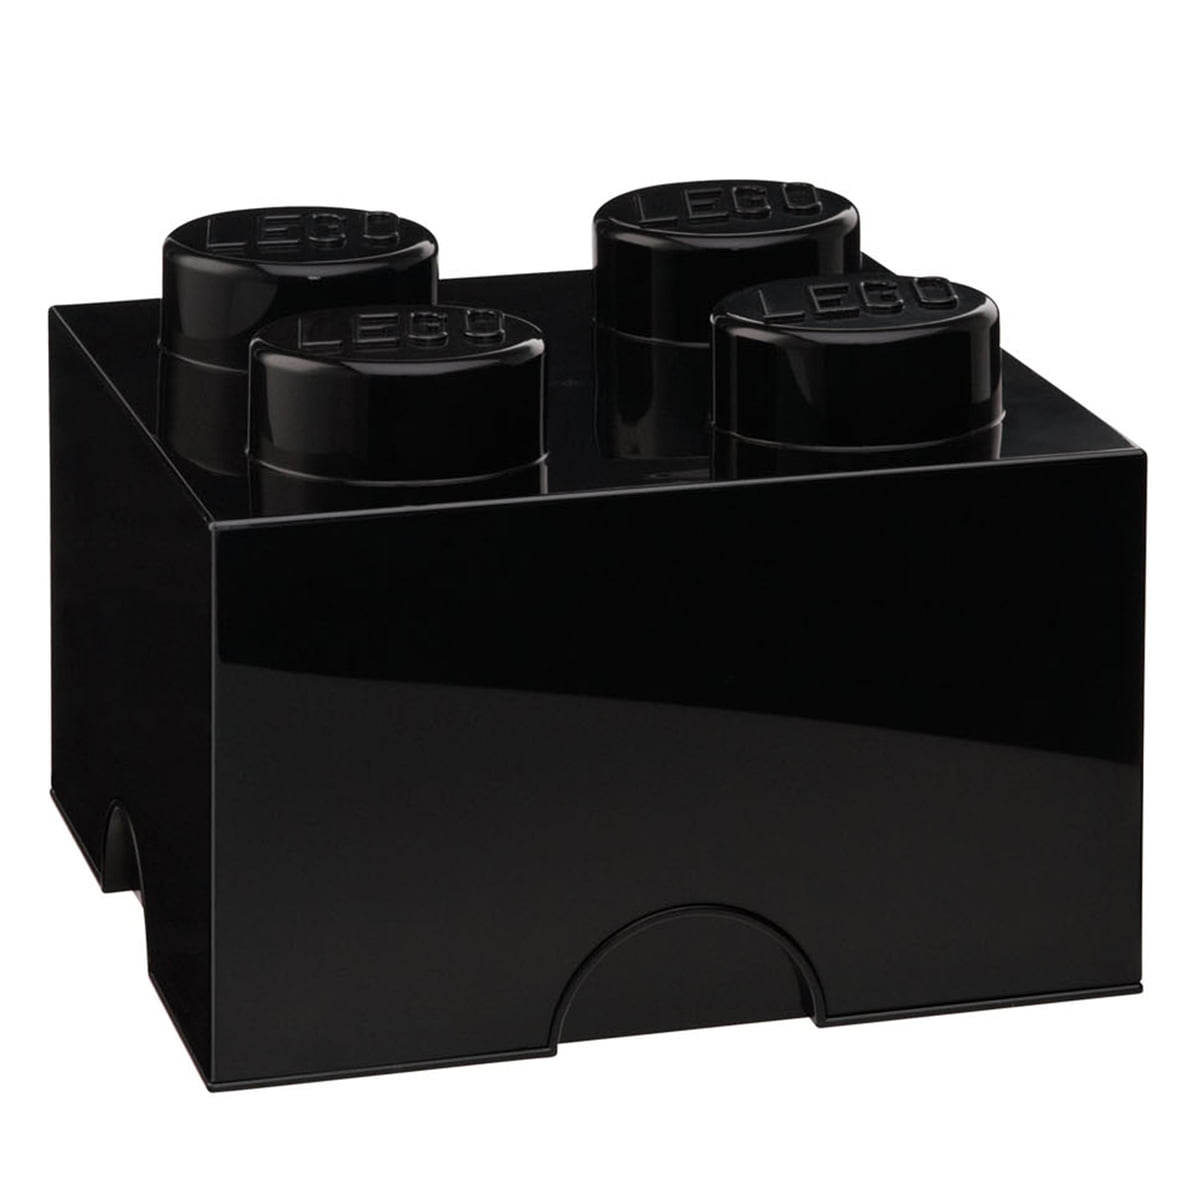 Lego - Storage Brick 4, schwarz | Kinderzimmer > Spielzeuge | Schwarz | Lego